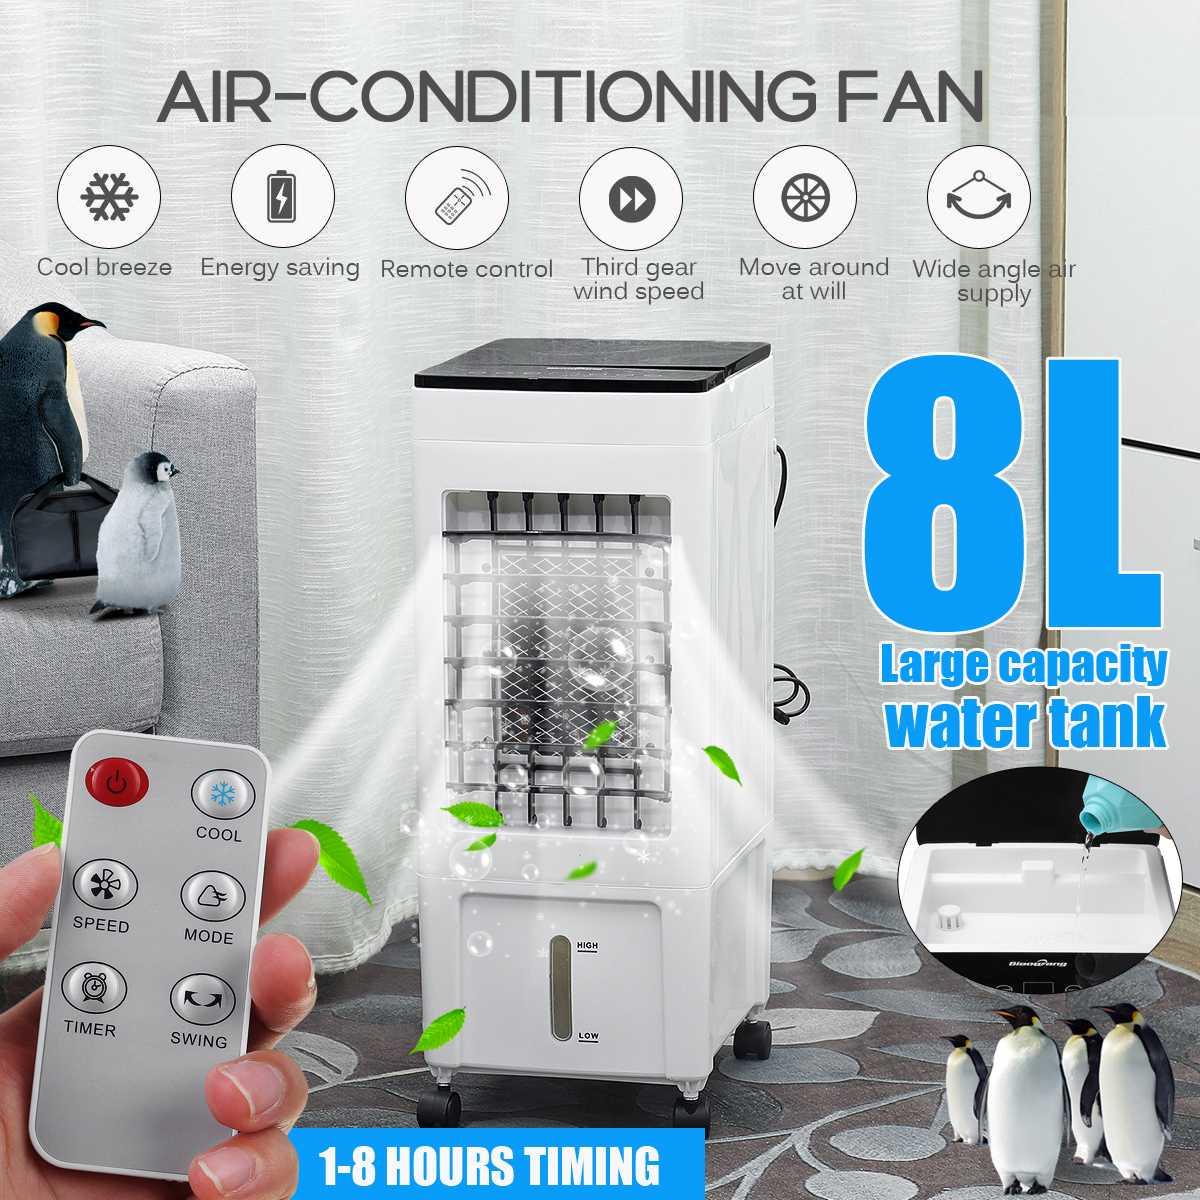 refrigerador de ar ventilador mini condicionador de ar refrigerador ventilador poderoso